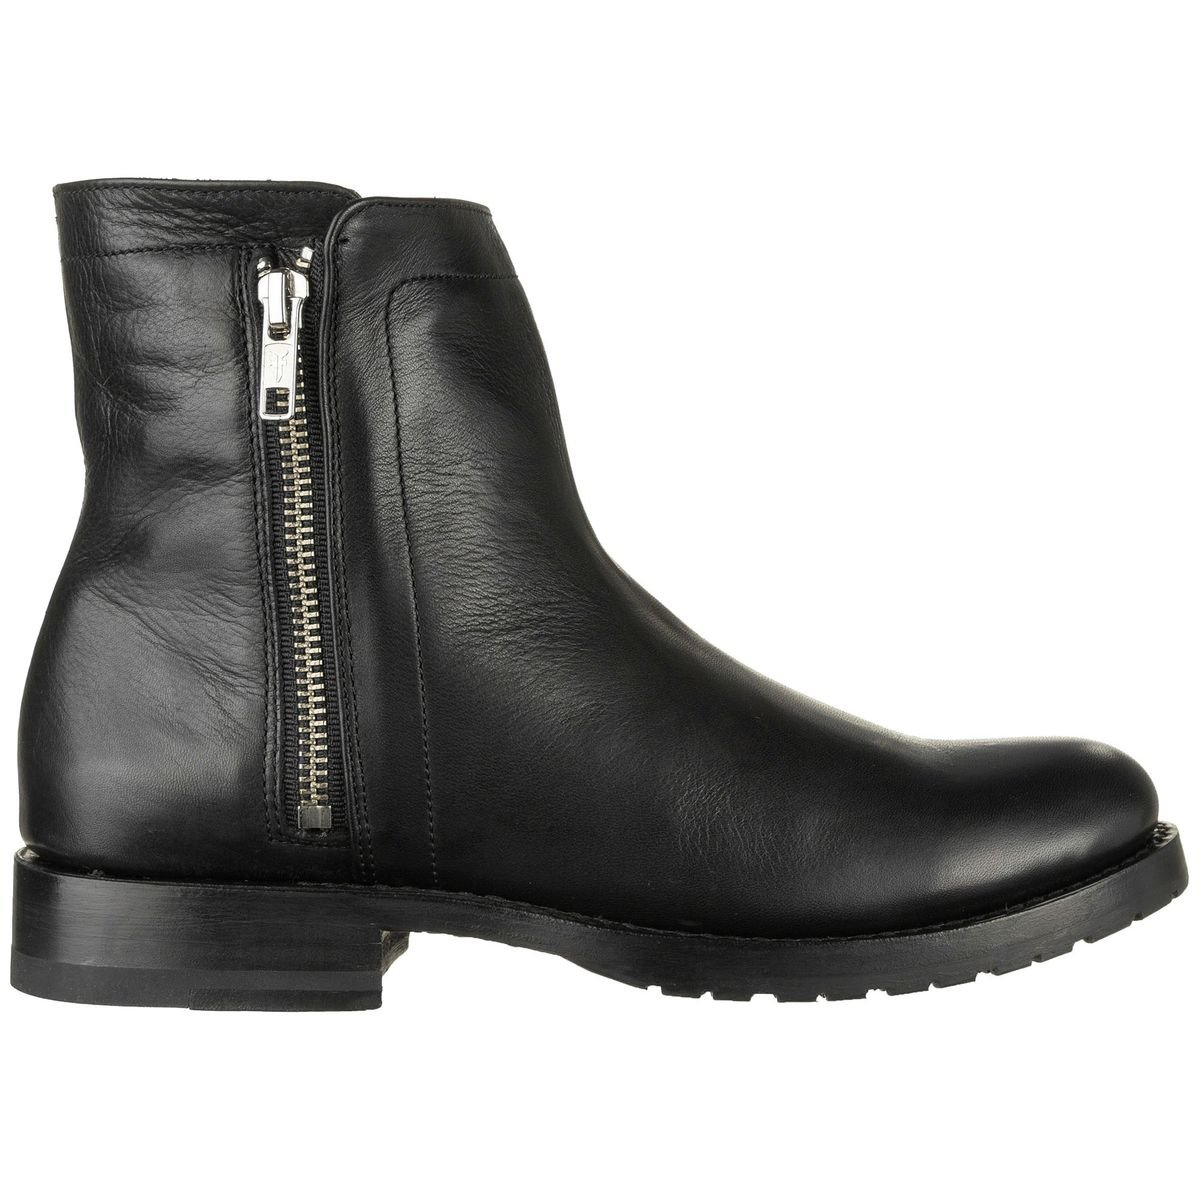 FRYE Women's Natalie Double Zip Boot, Black Polished Soft Full Grain, 8 M US